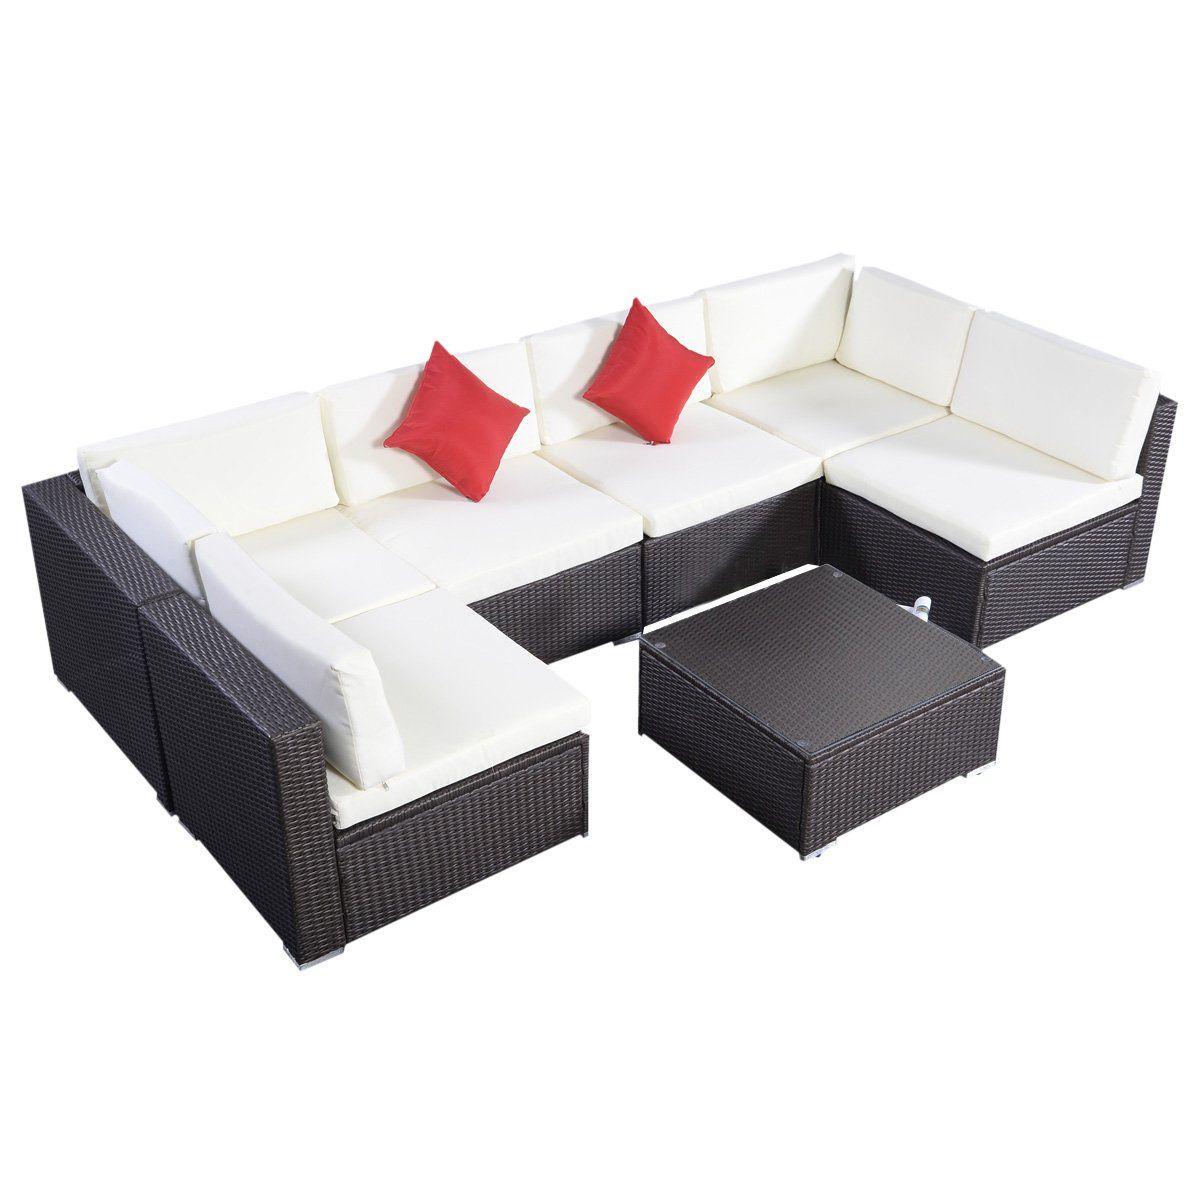 tangkula 7 pcs outdoor patio wicker furniture sets rattan sofas